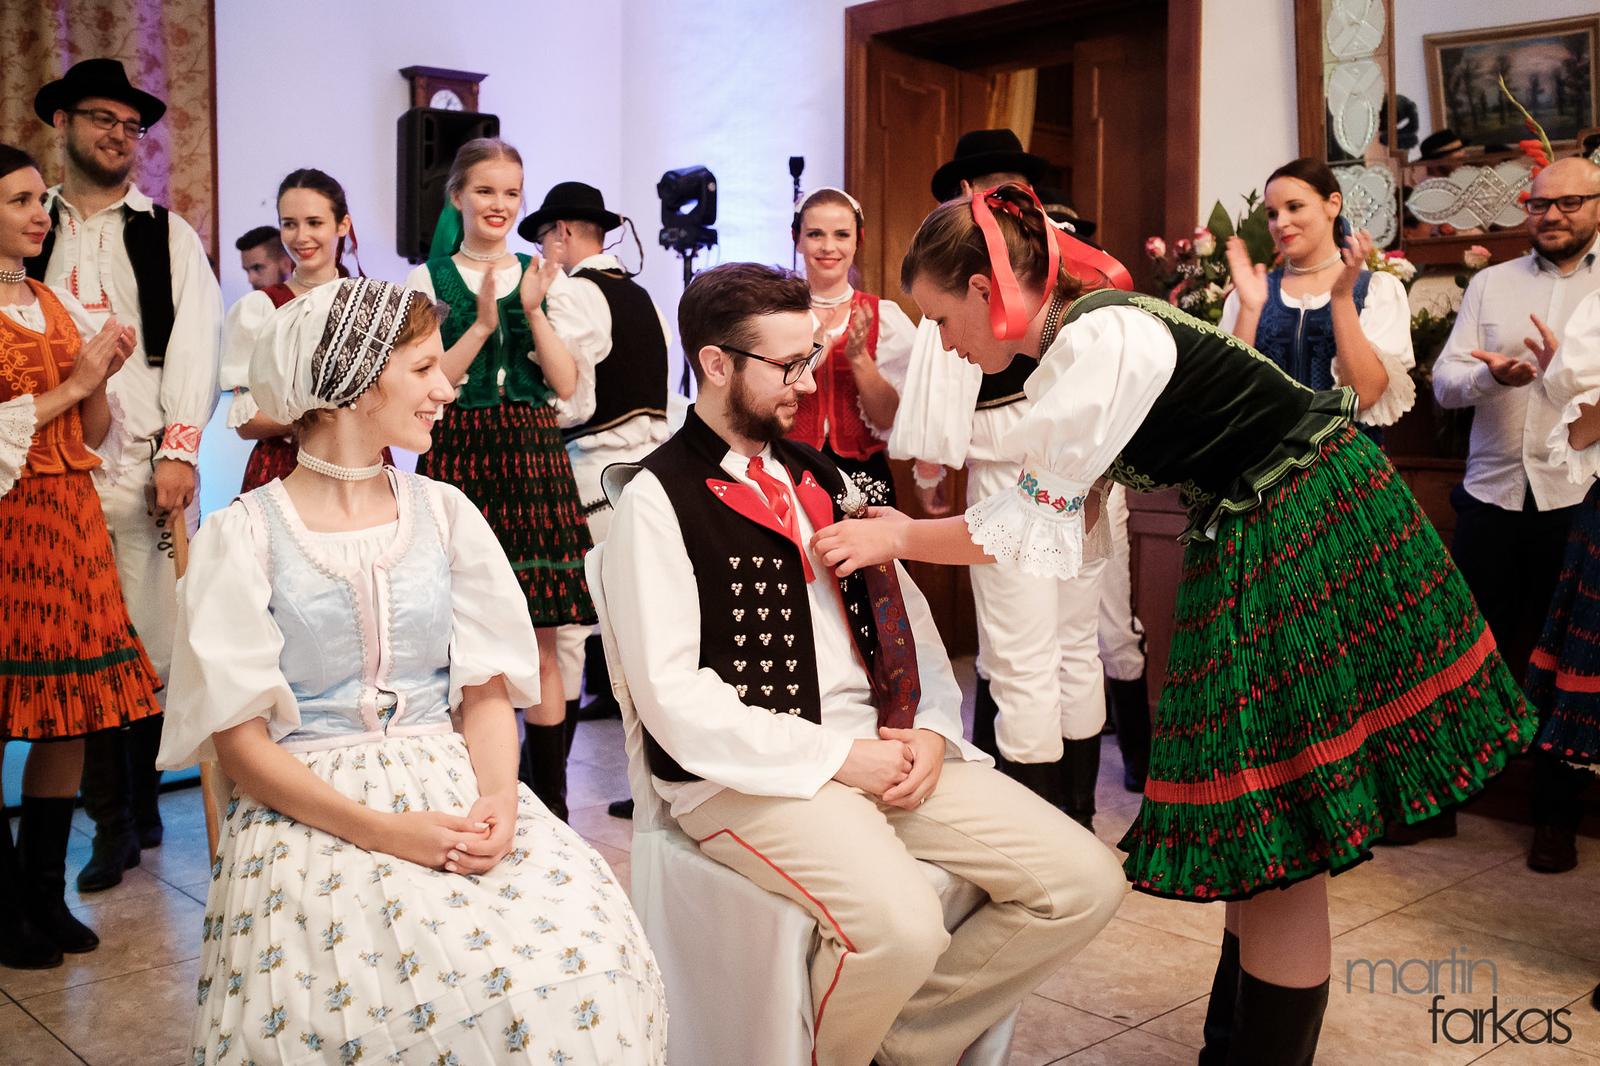 Svadba Smolenice, Zámok 05